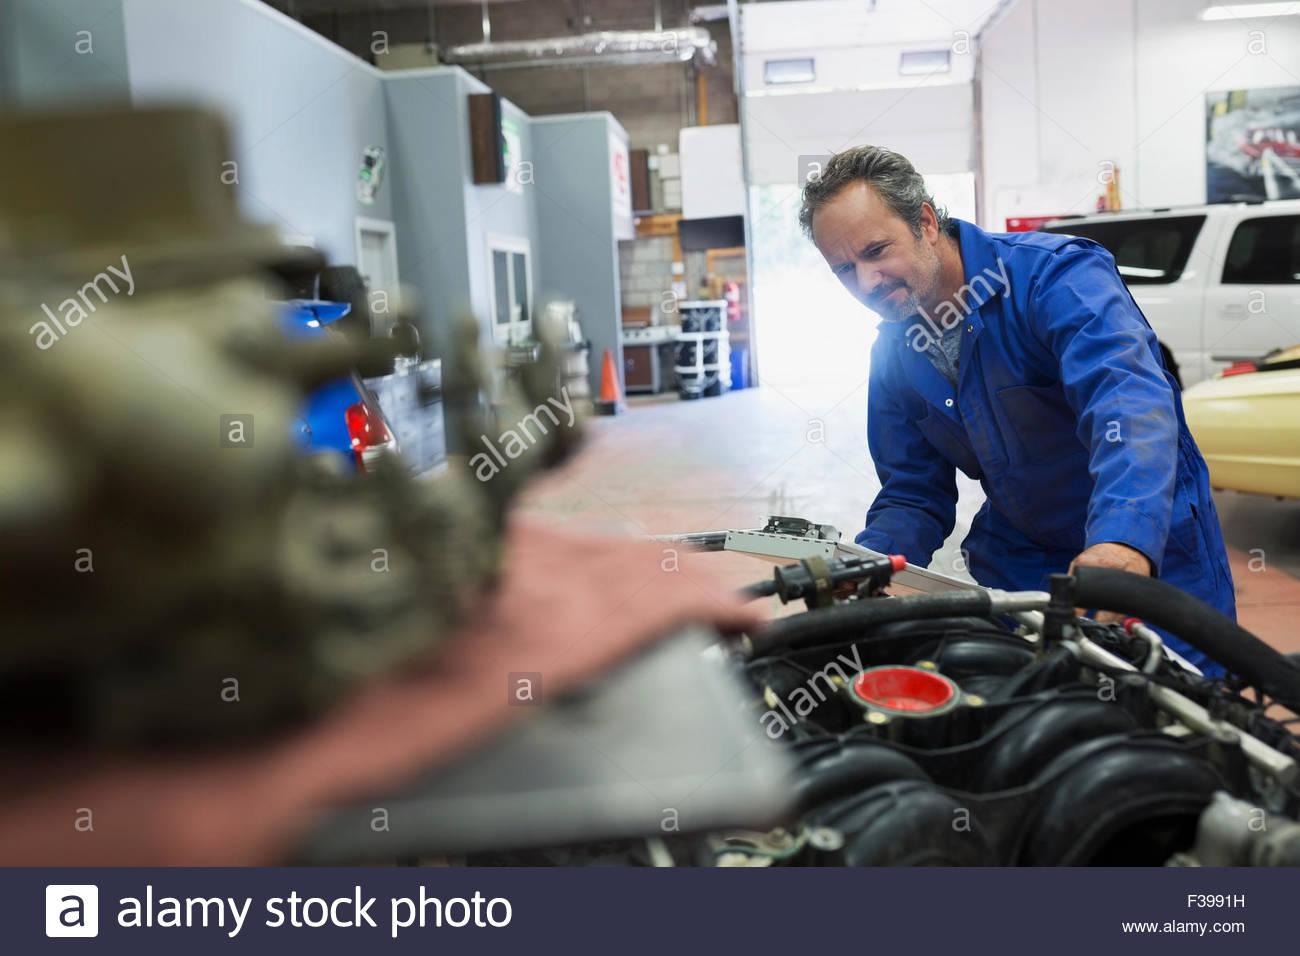 Mechanic examining engine in auto repair shop - Stock Image